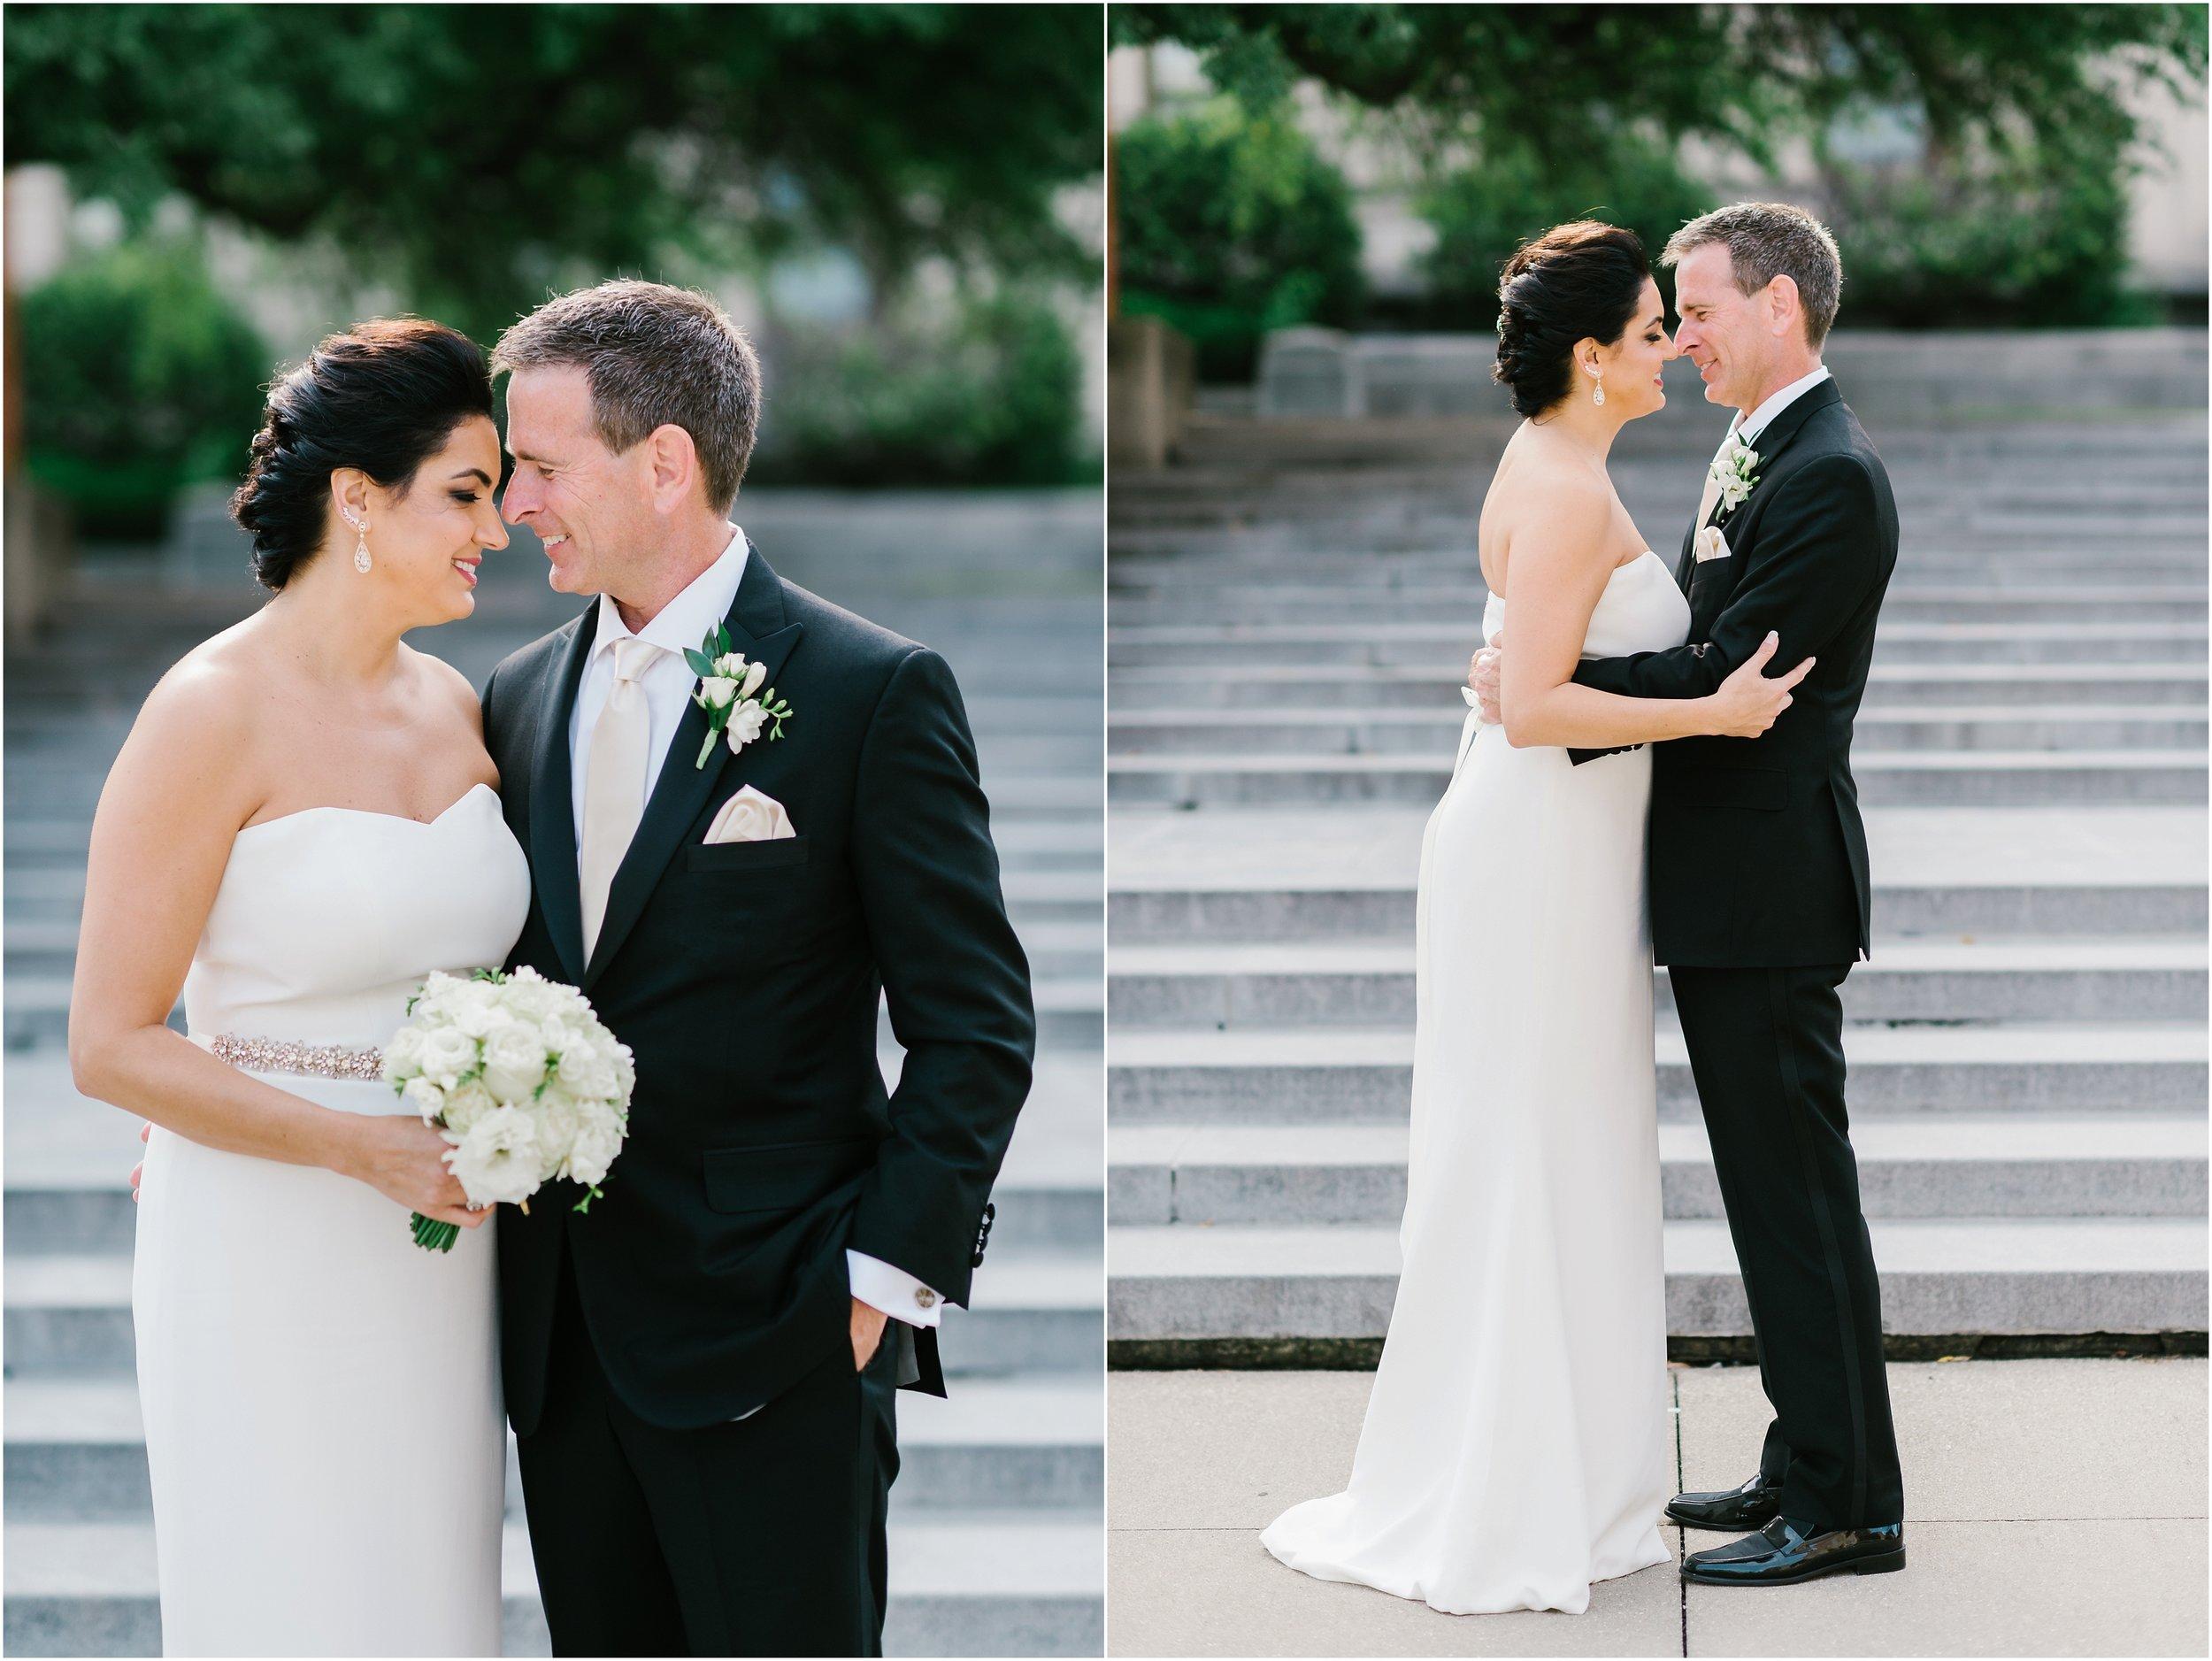 Rebecca_Shehorn_Photography_Indianapolis_Wedding_Photographer_8551.jpg